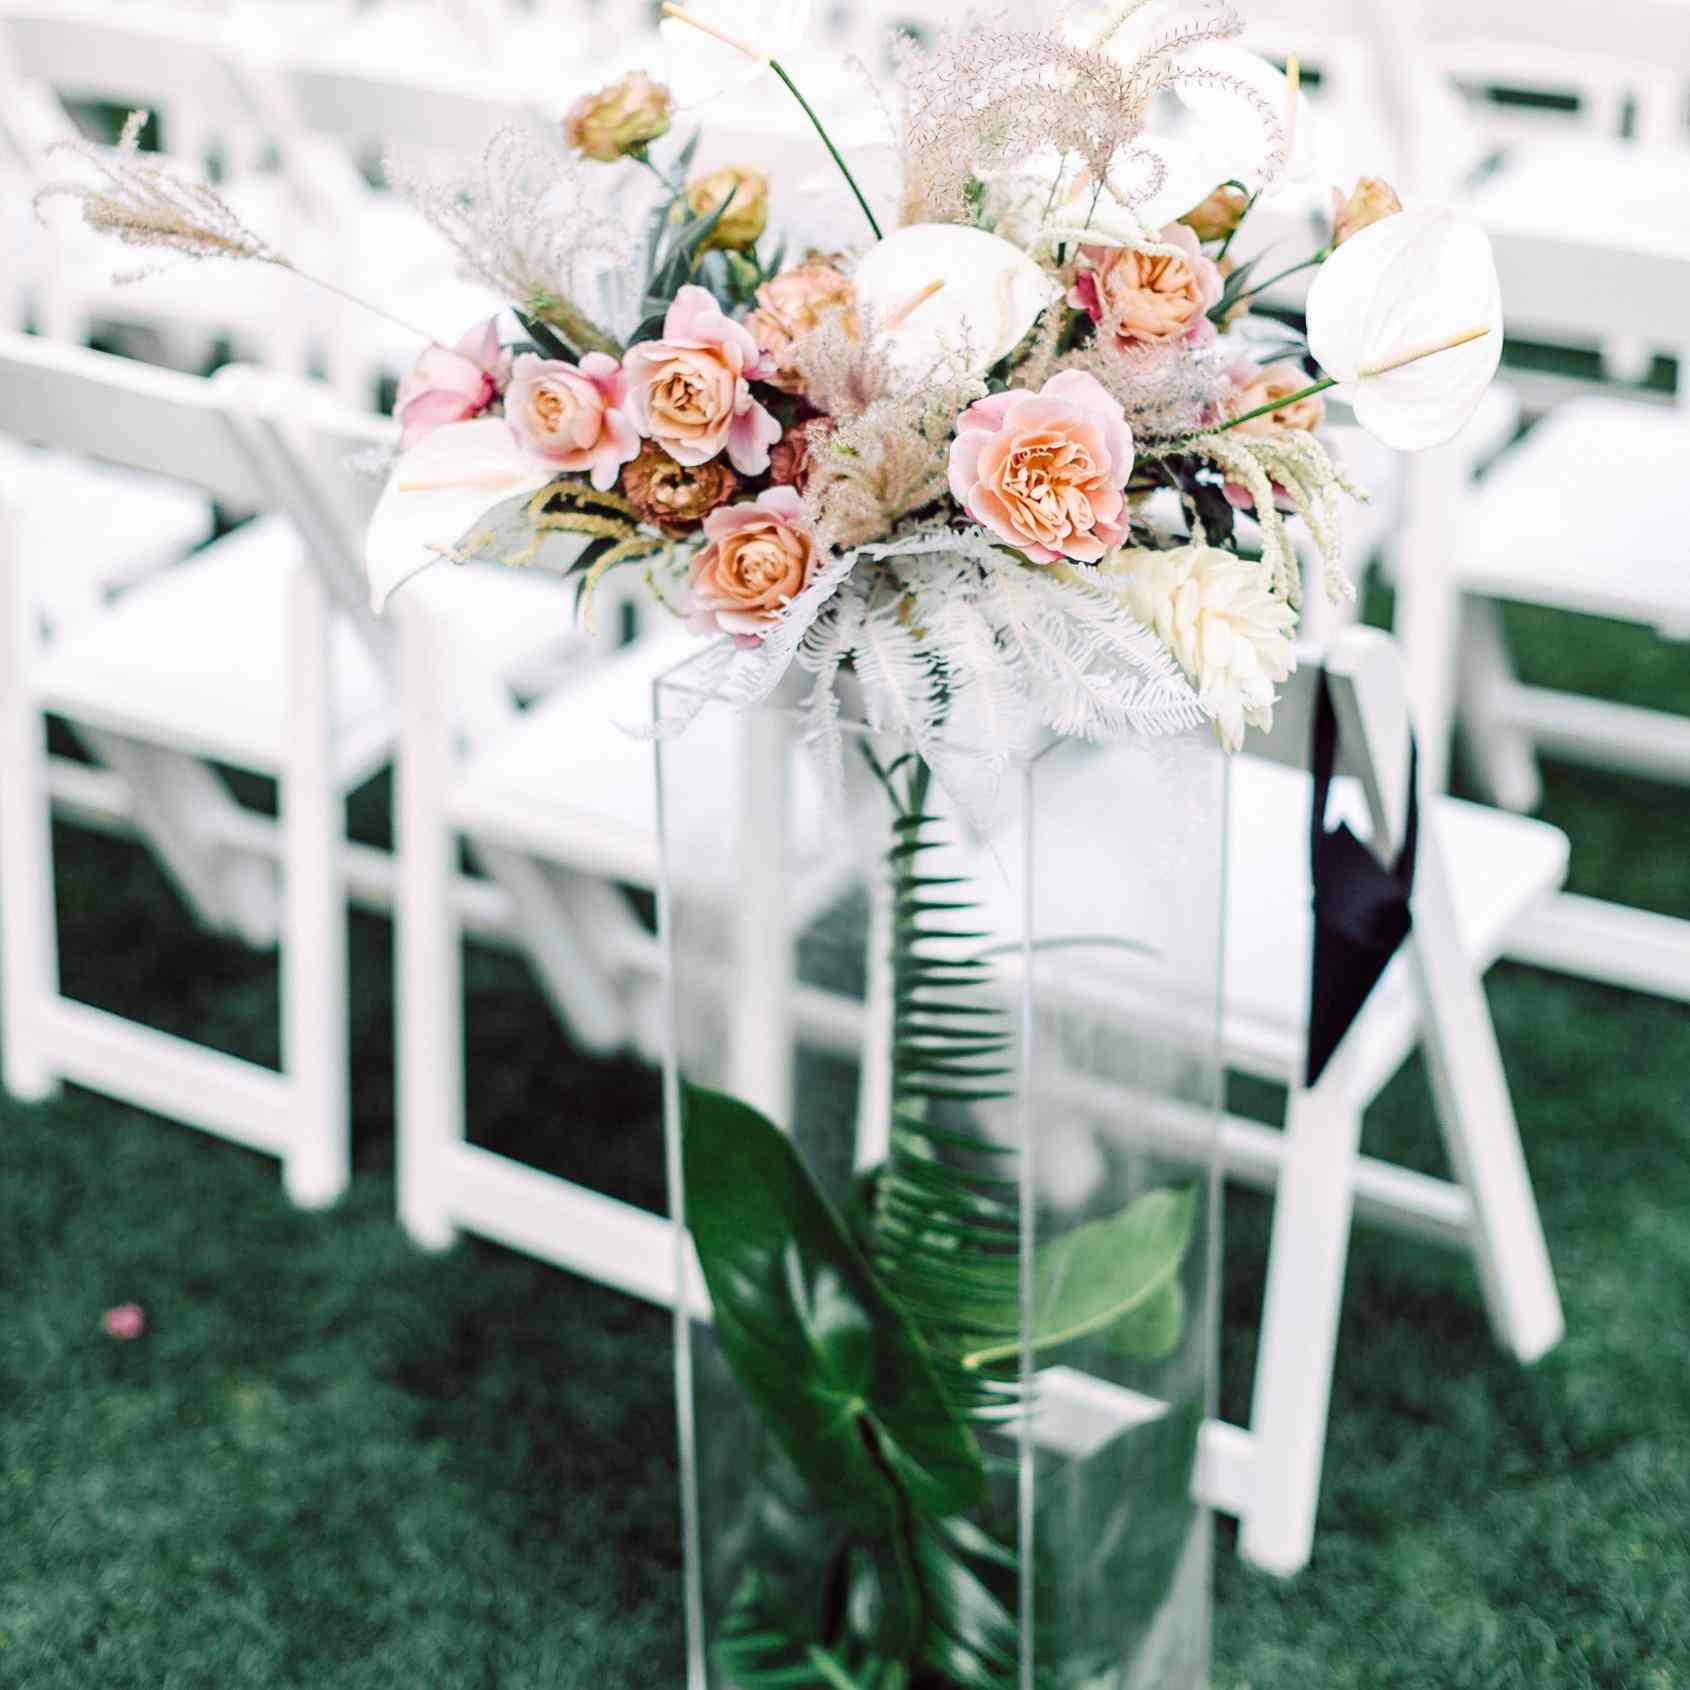 Floral arrangement at ceremony